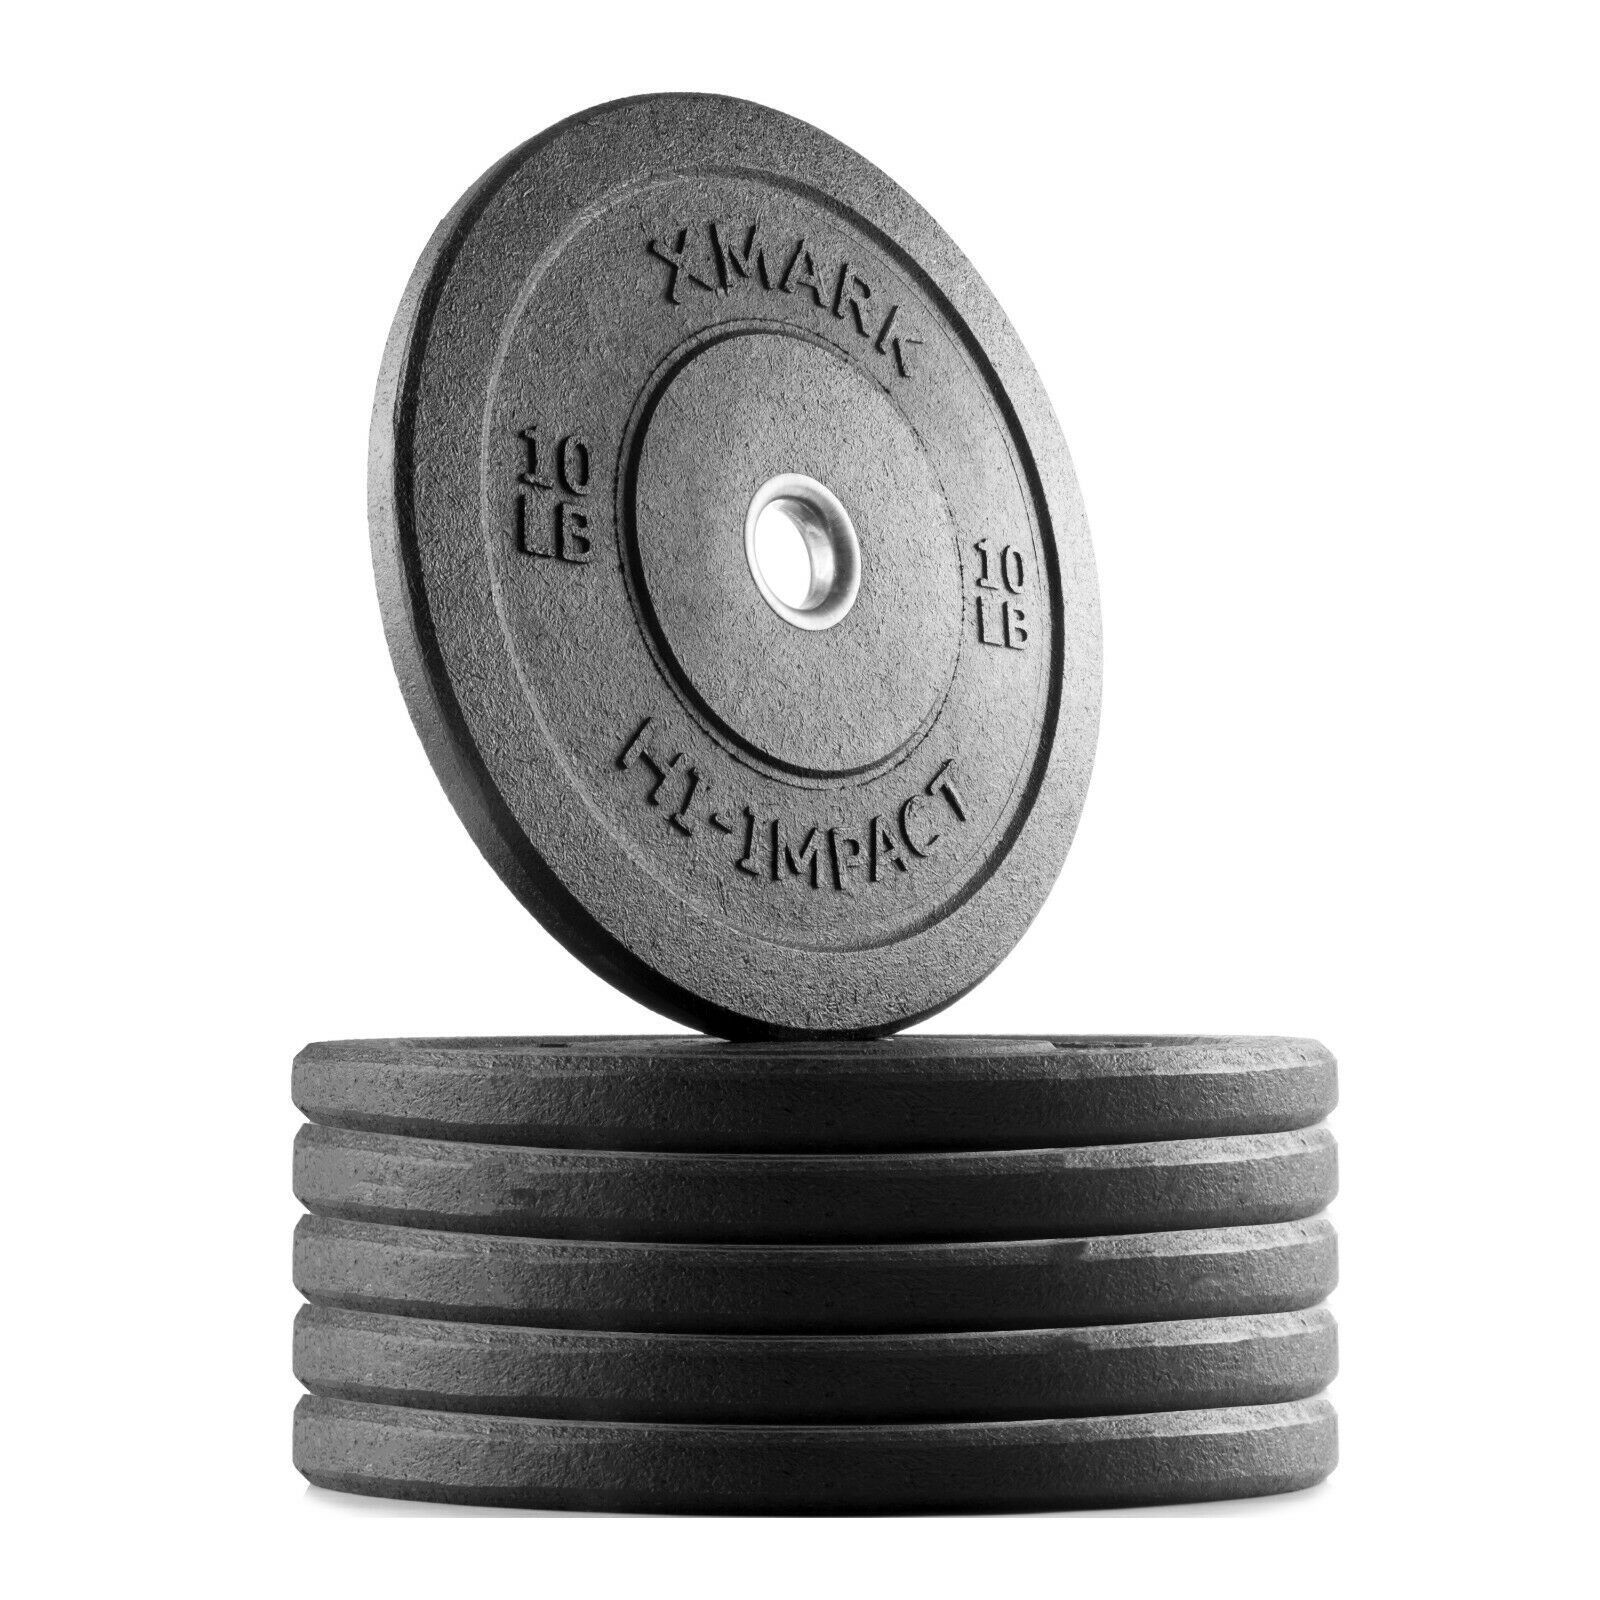 XMark XM -3391 -10 -SIX HI -IMPACT Three 10 lb. Par av Olympic Bumper Plate Weights